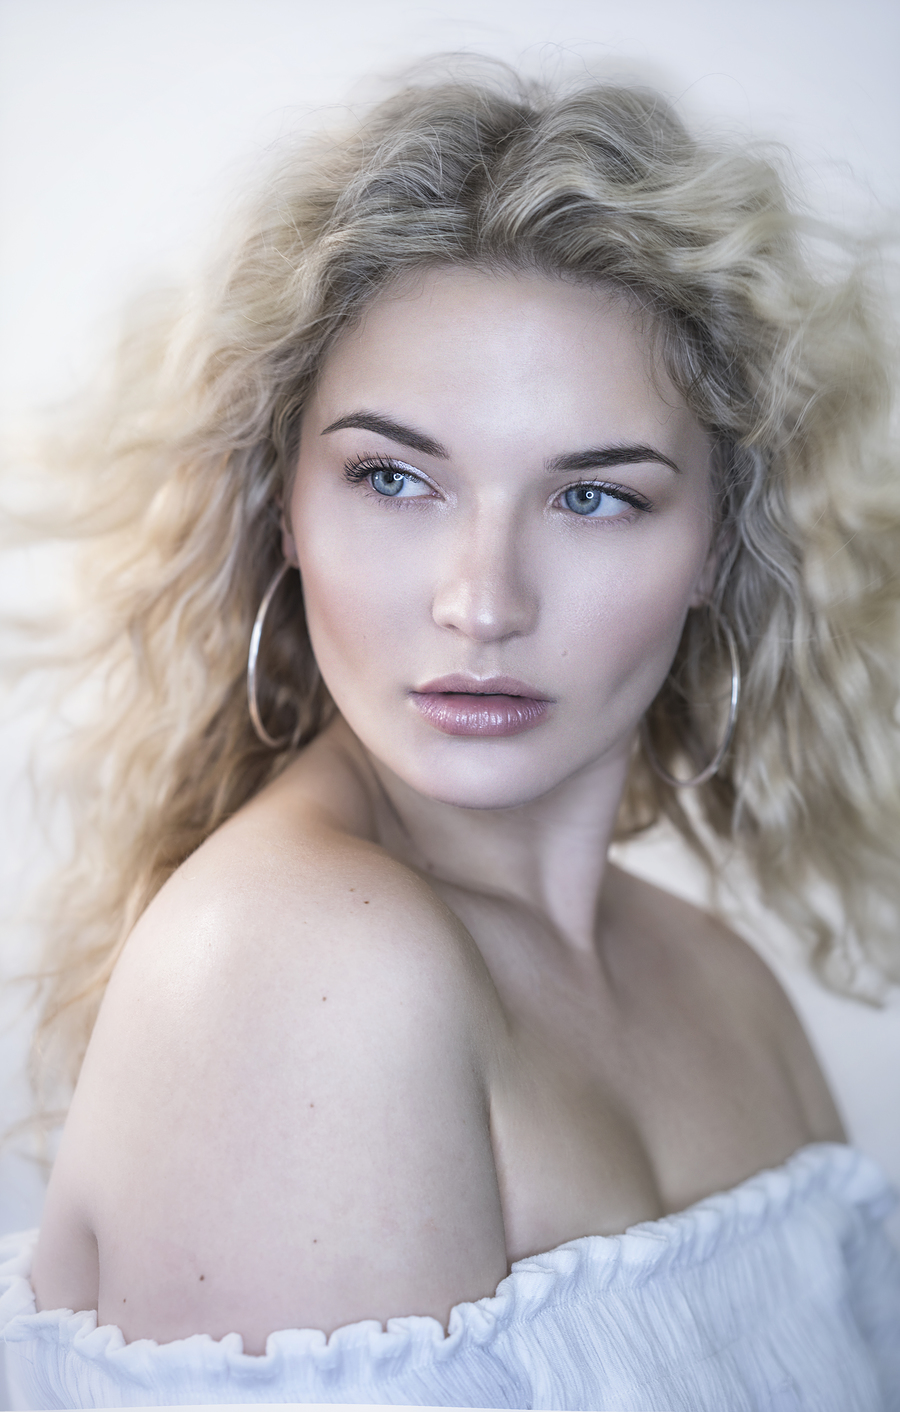 Gloss / Model Jessica Megan / Uploaded 28th July 2018 @ 04:52 PM